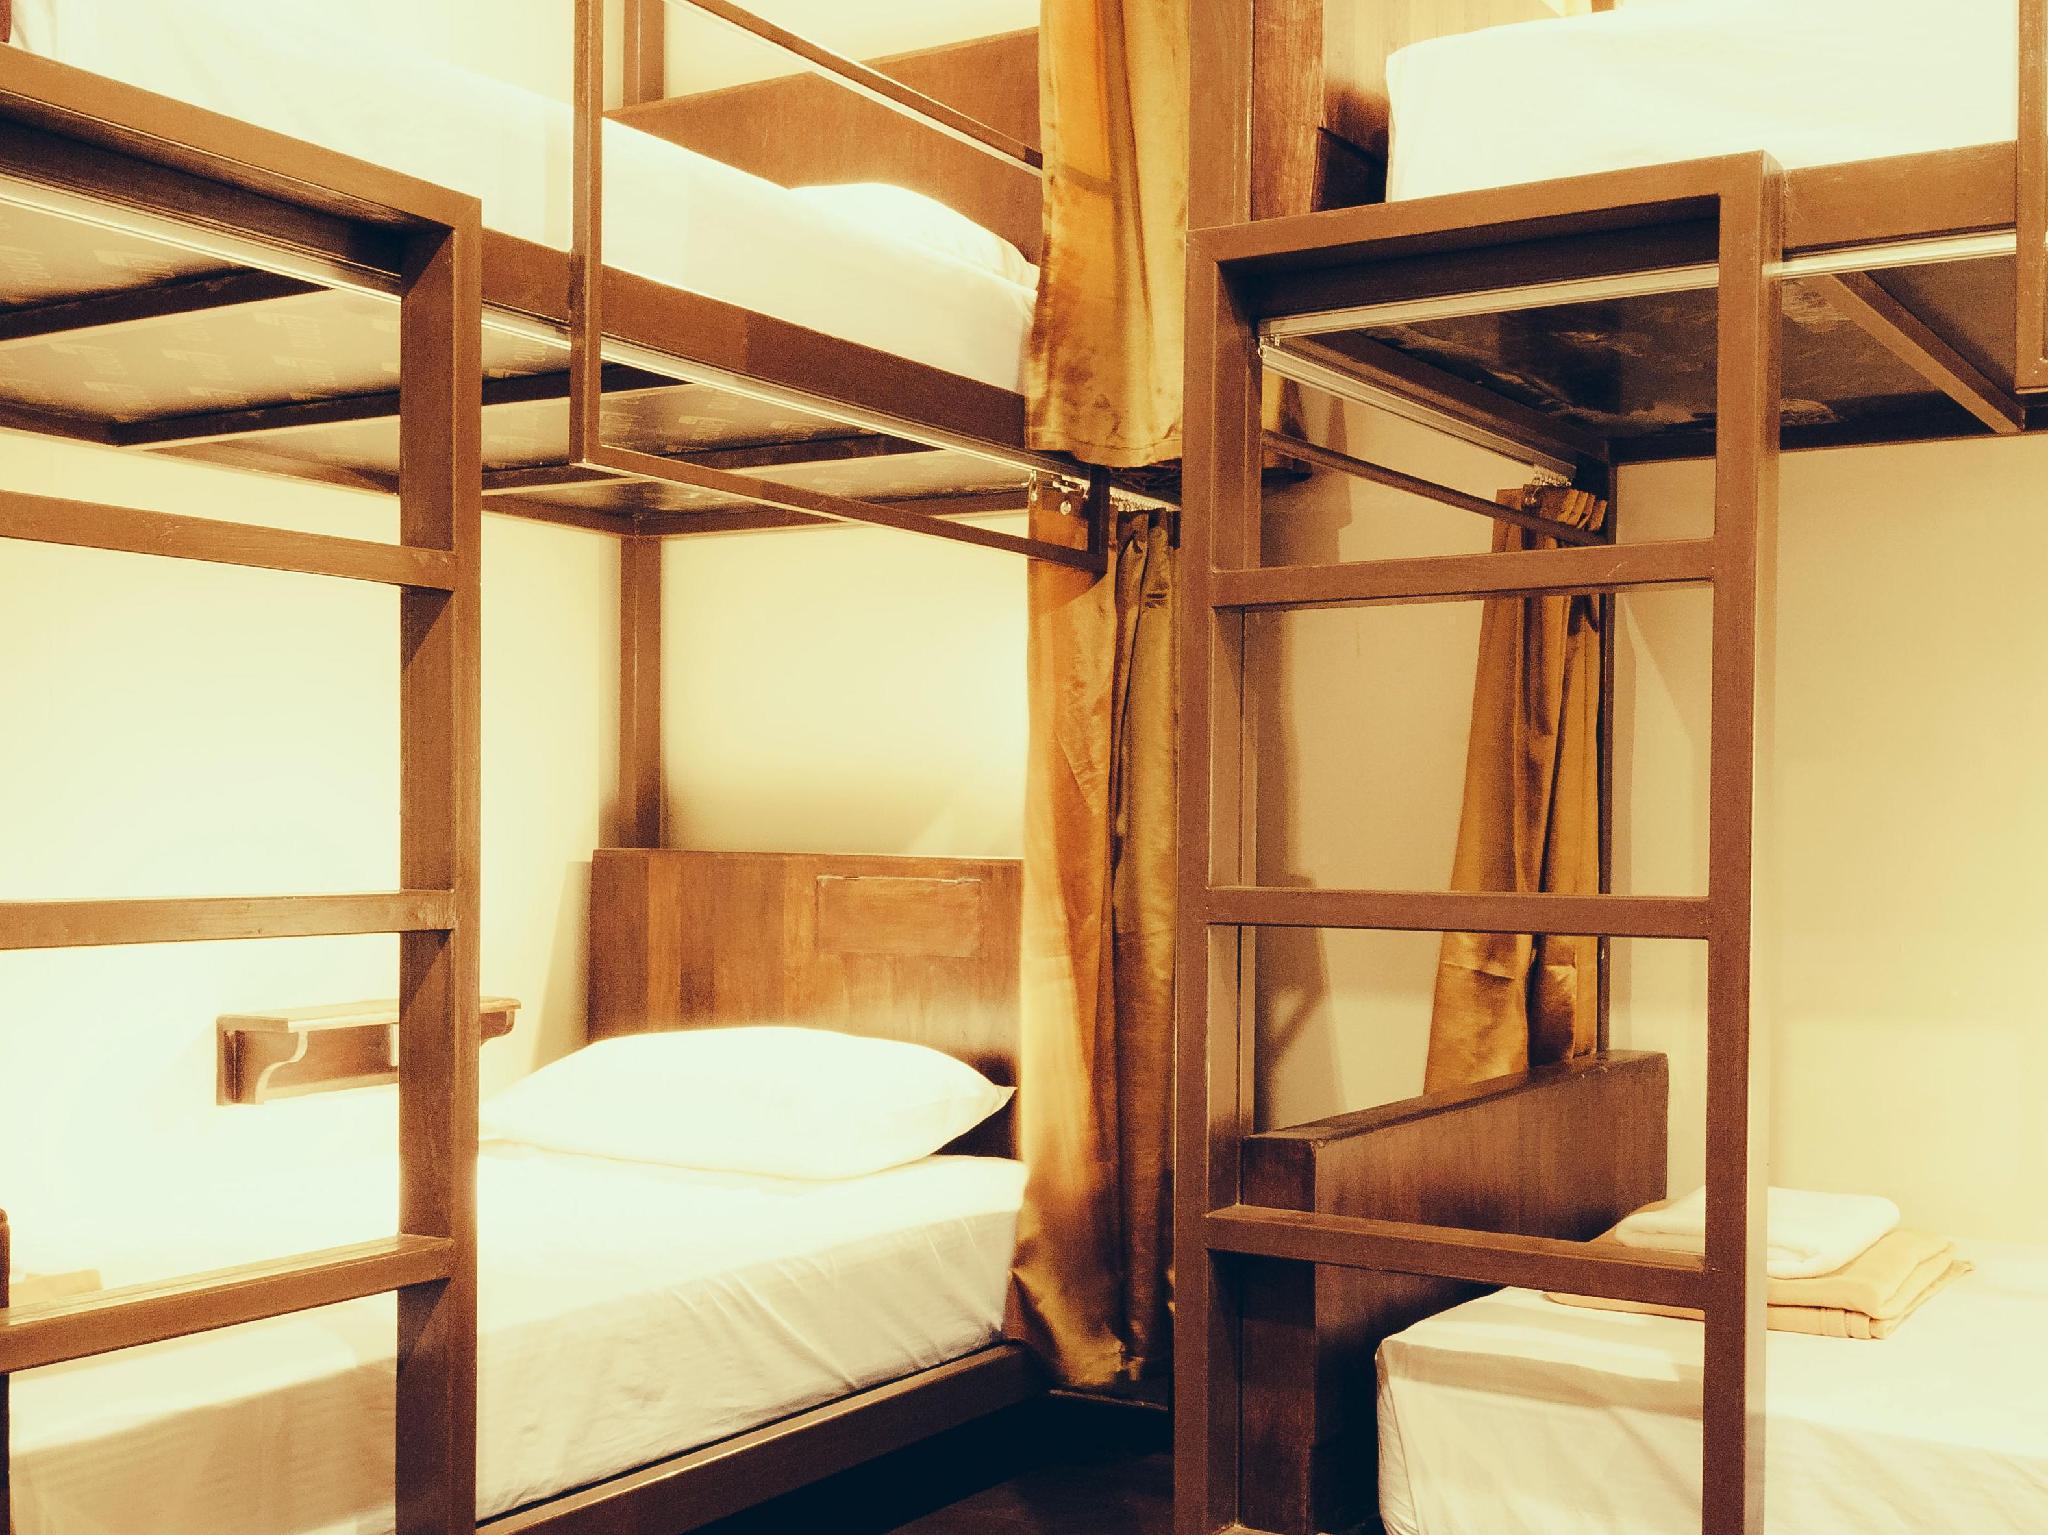 The Memory at On On Hostel,เดอะ เมมโมรี แอท ออน ออน โฮสเทล